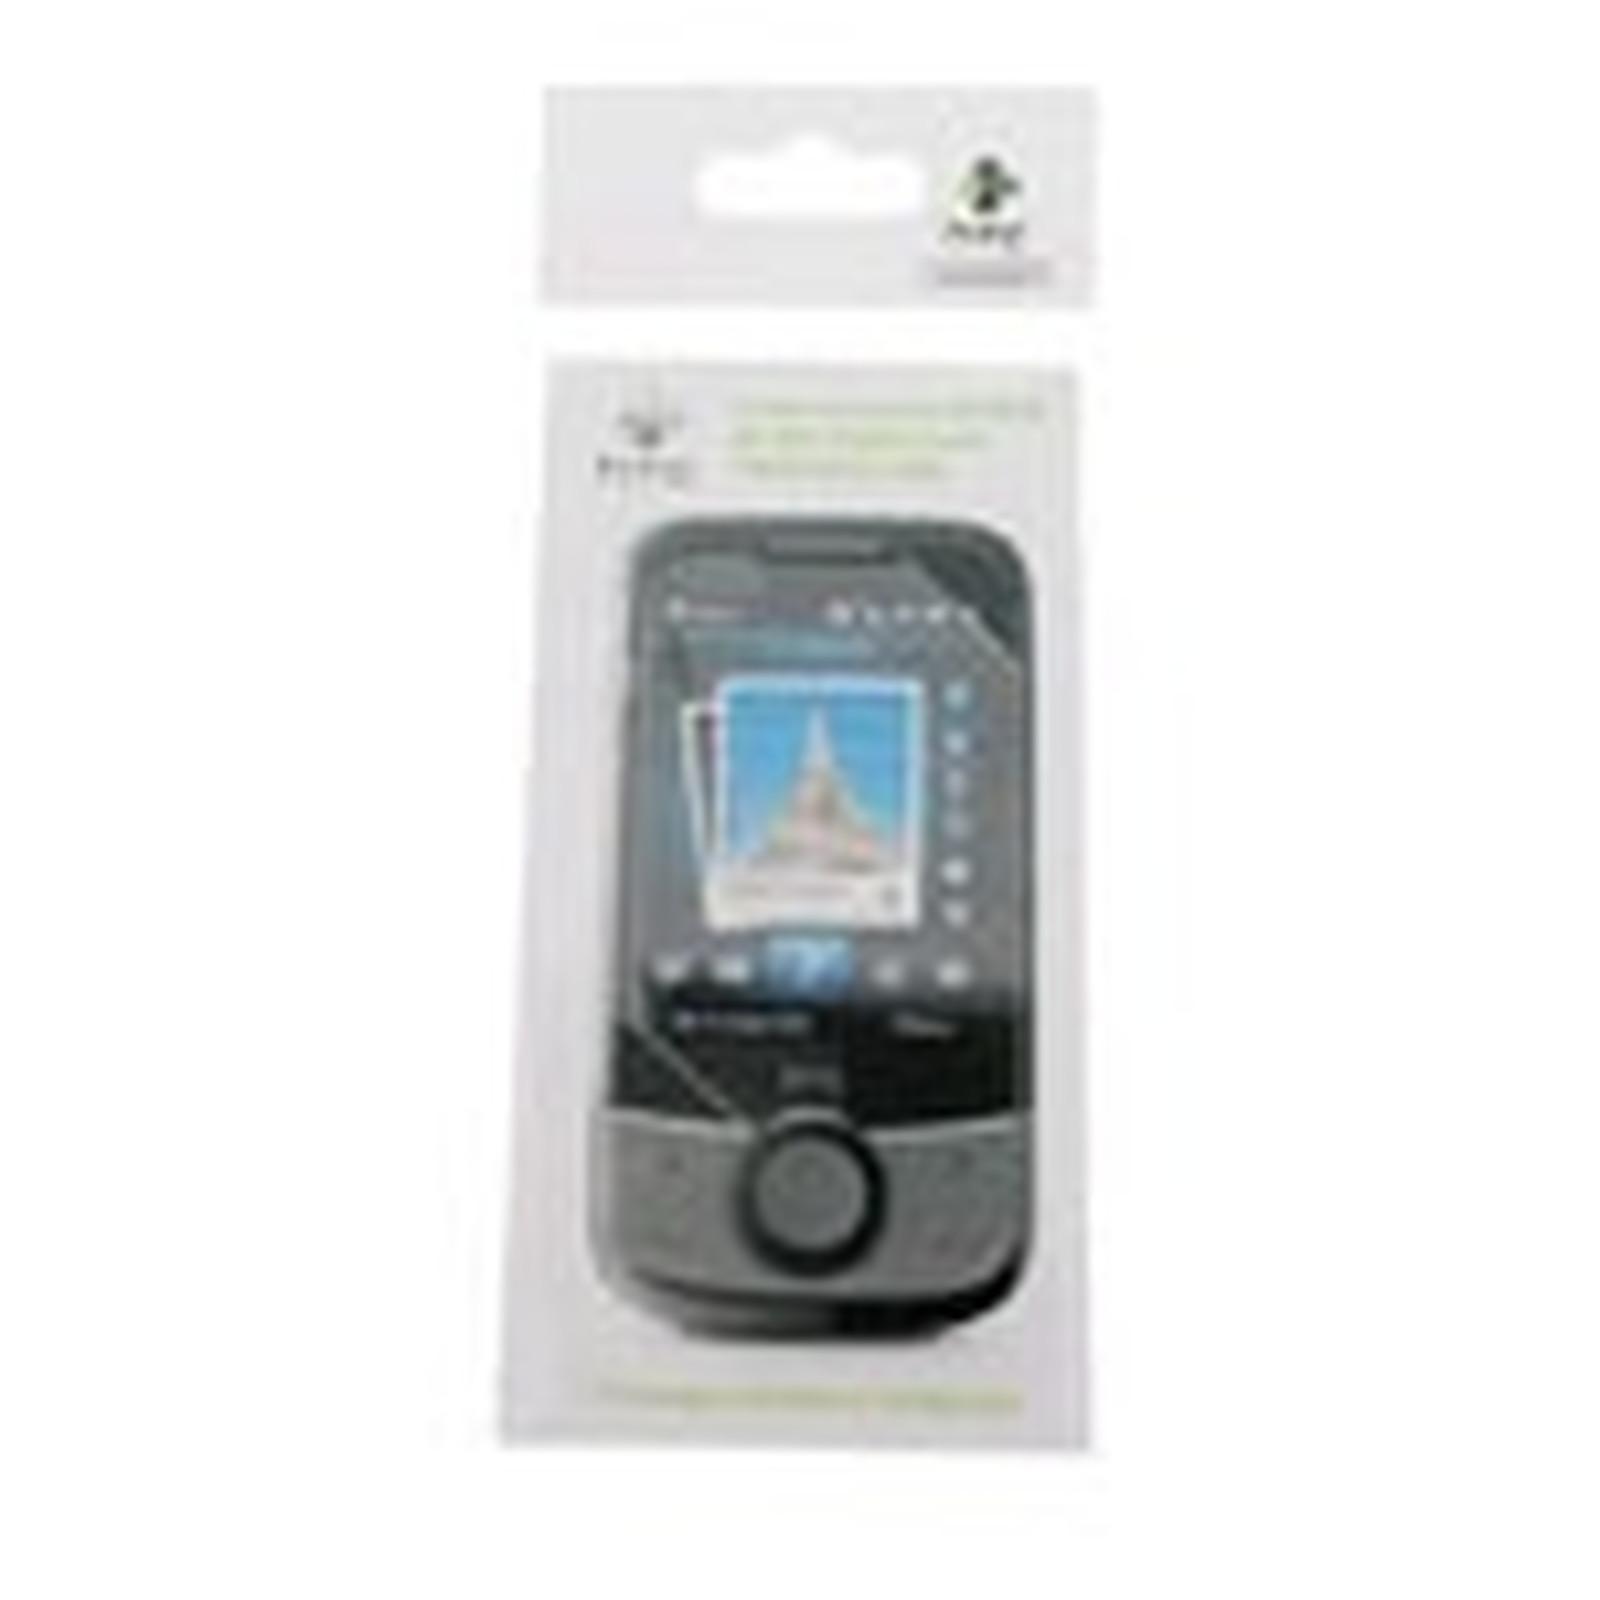 HTC SP P350